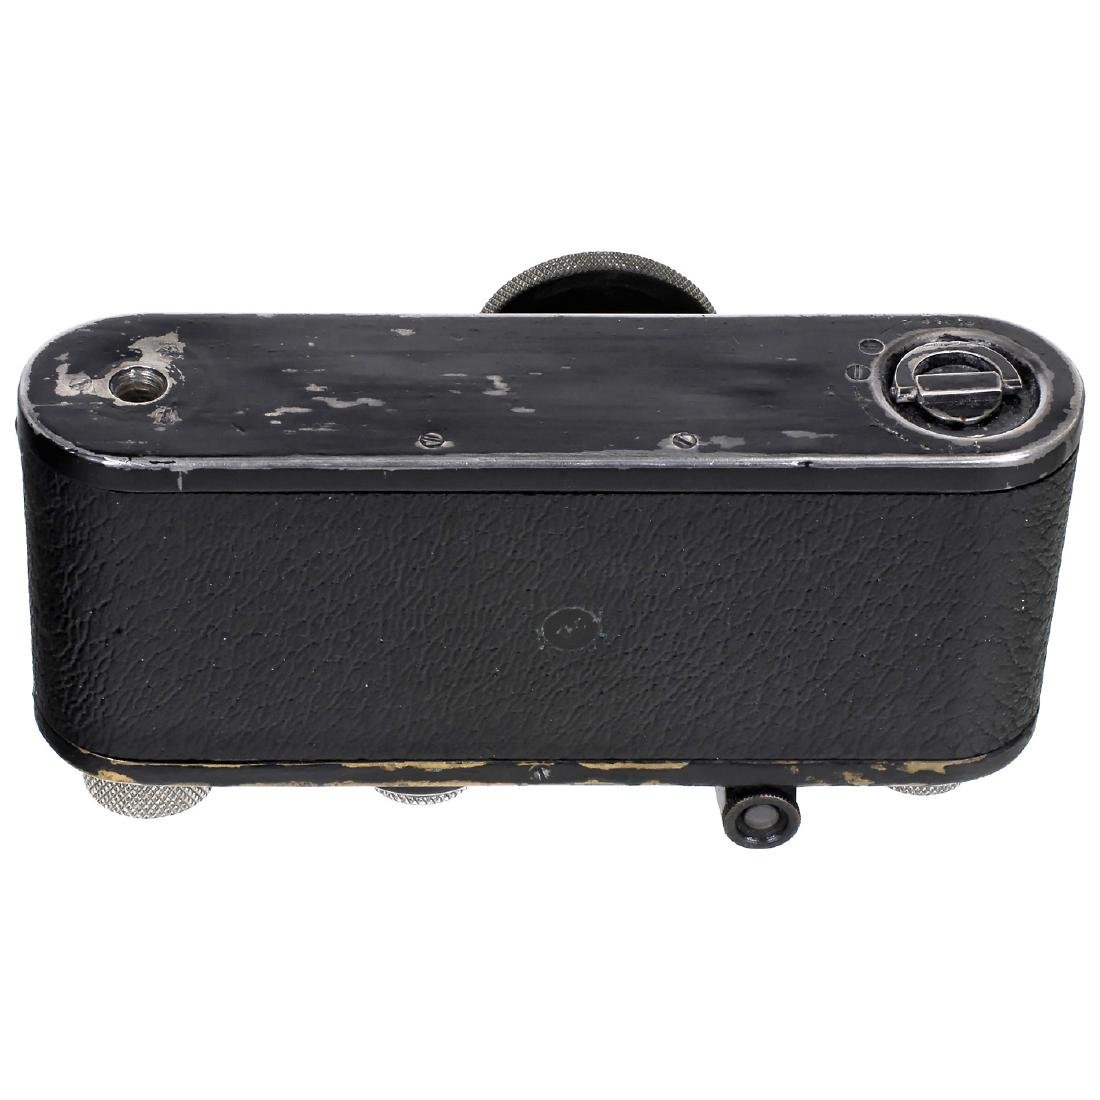 Leica I (A) with Elmar 3,5 (Near-Focus Version), 1928 - 2